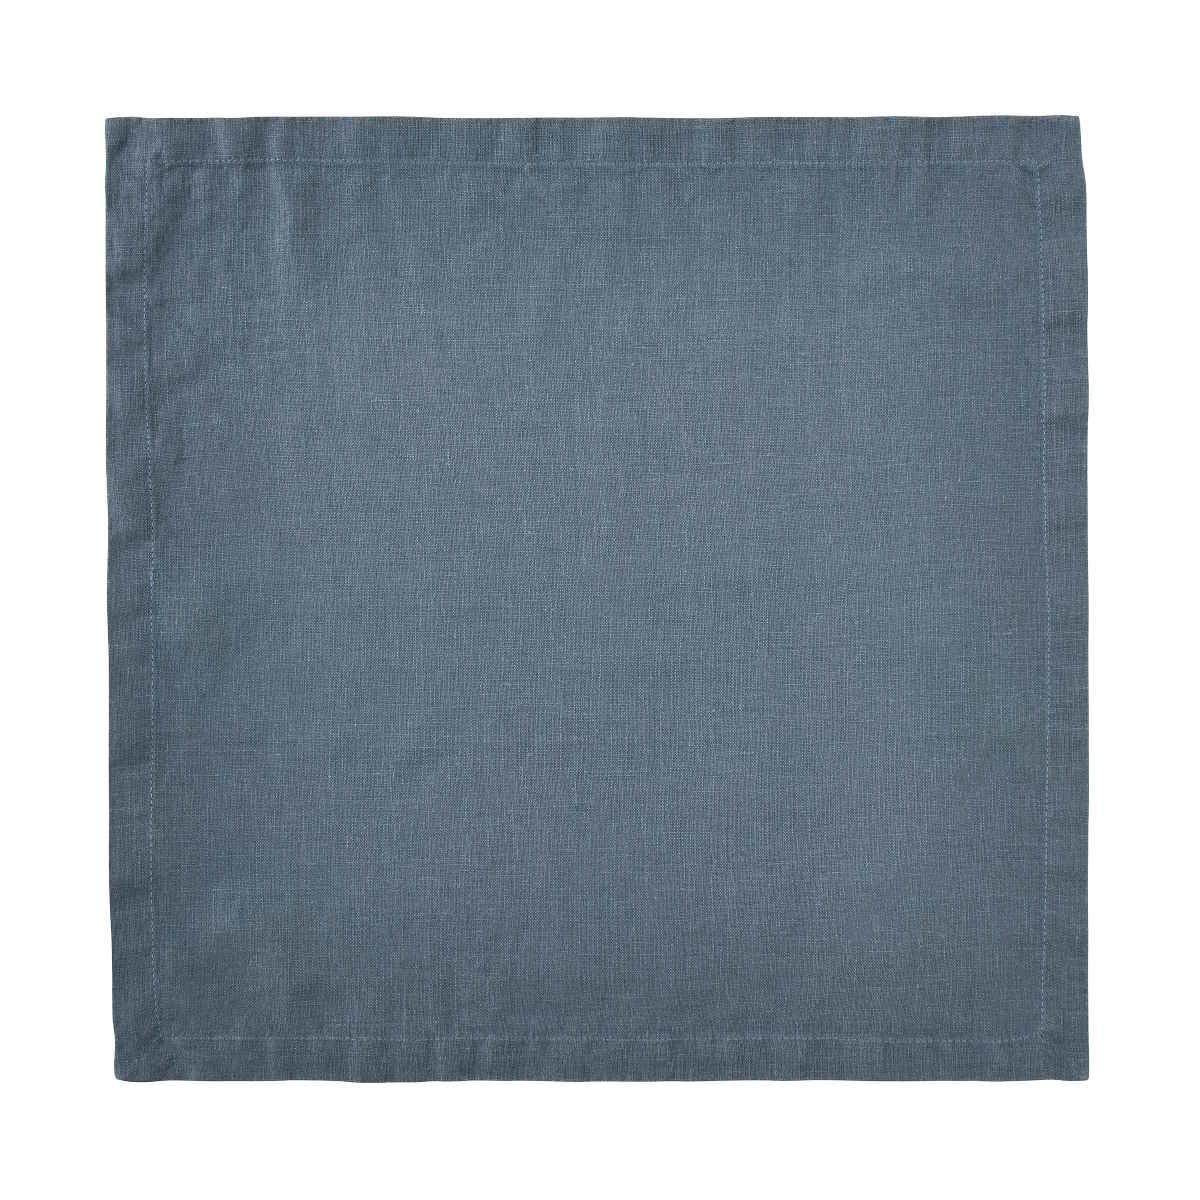 Butlers Riga Serviette 42x42 cm blau